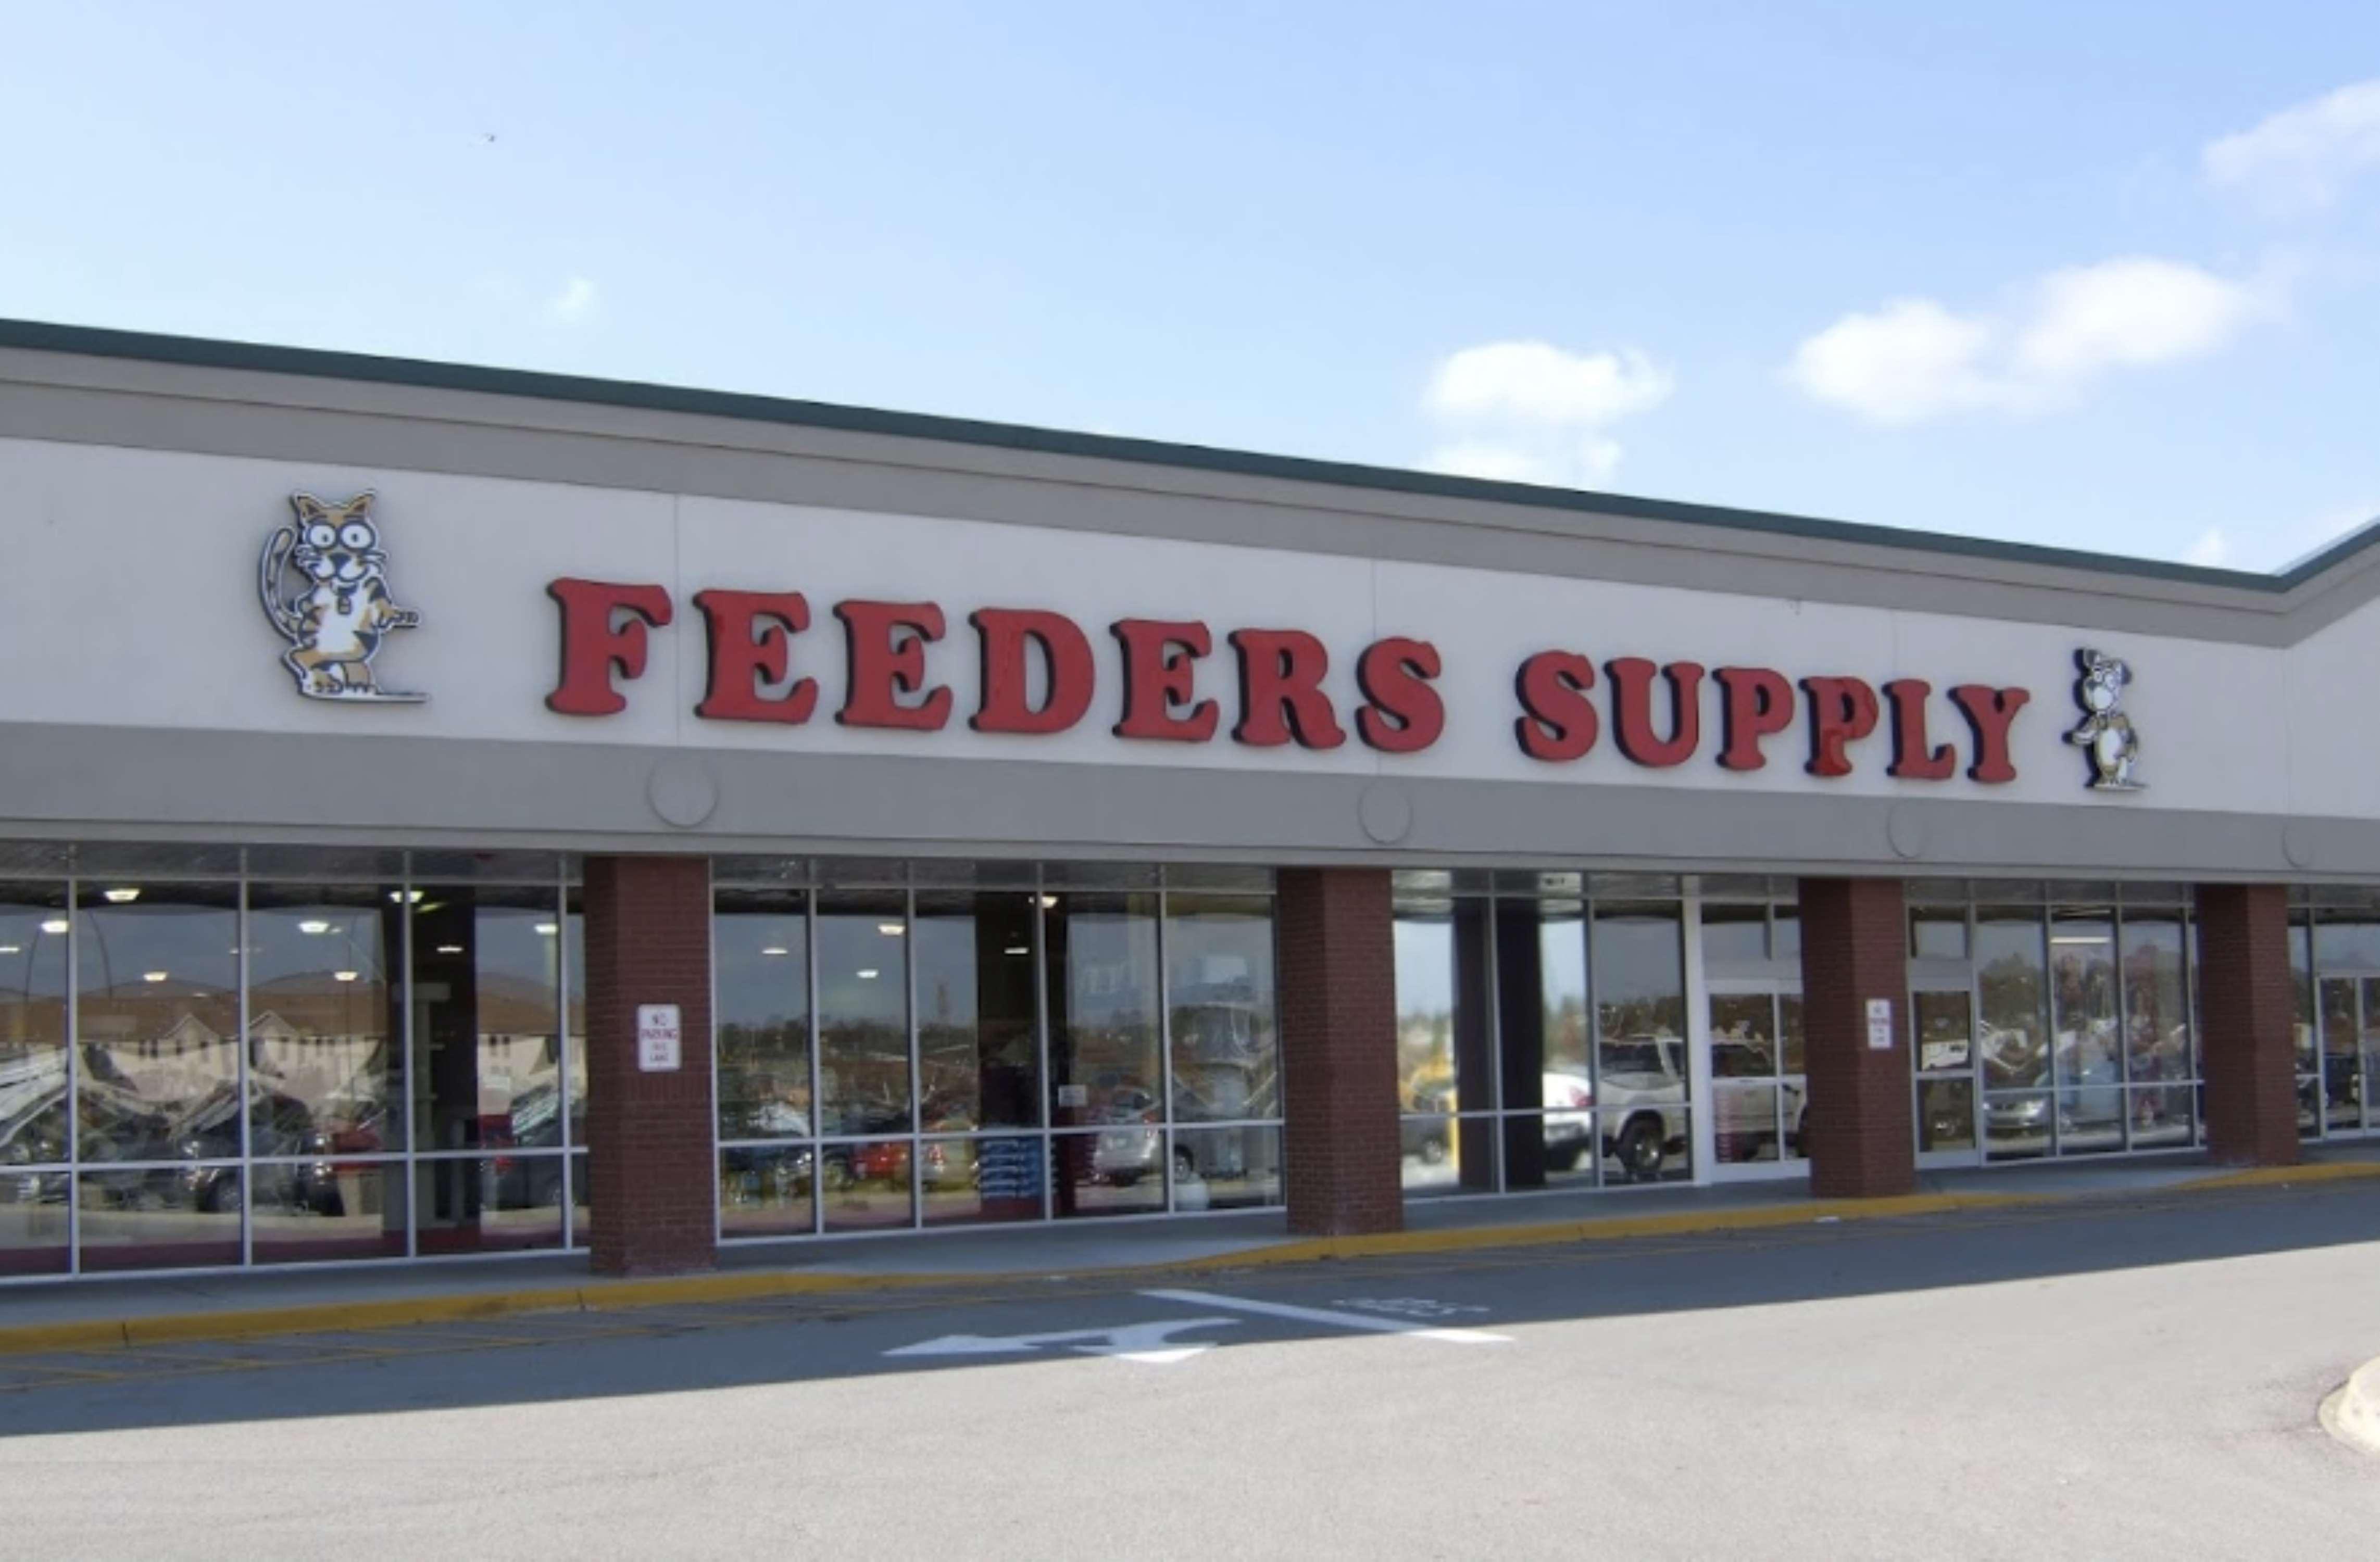 Feeders Supply